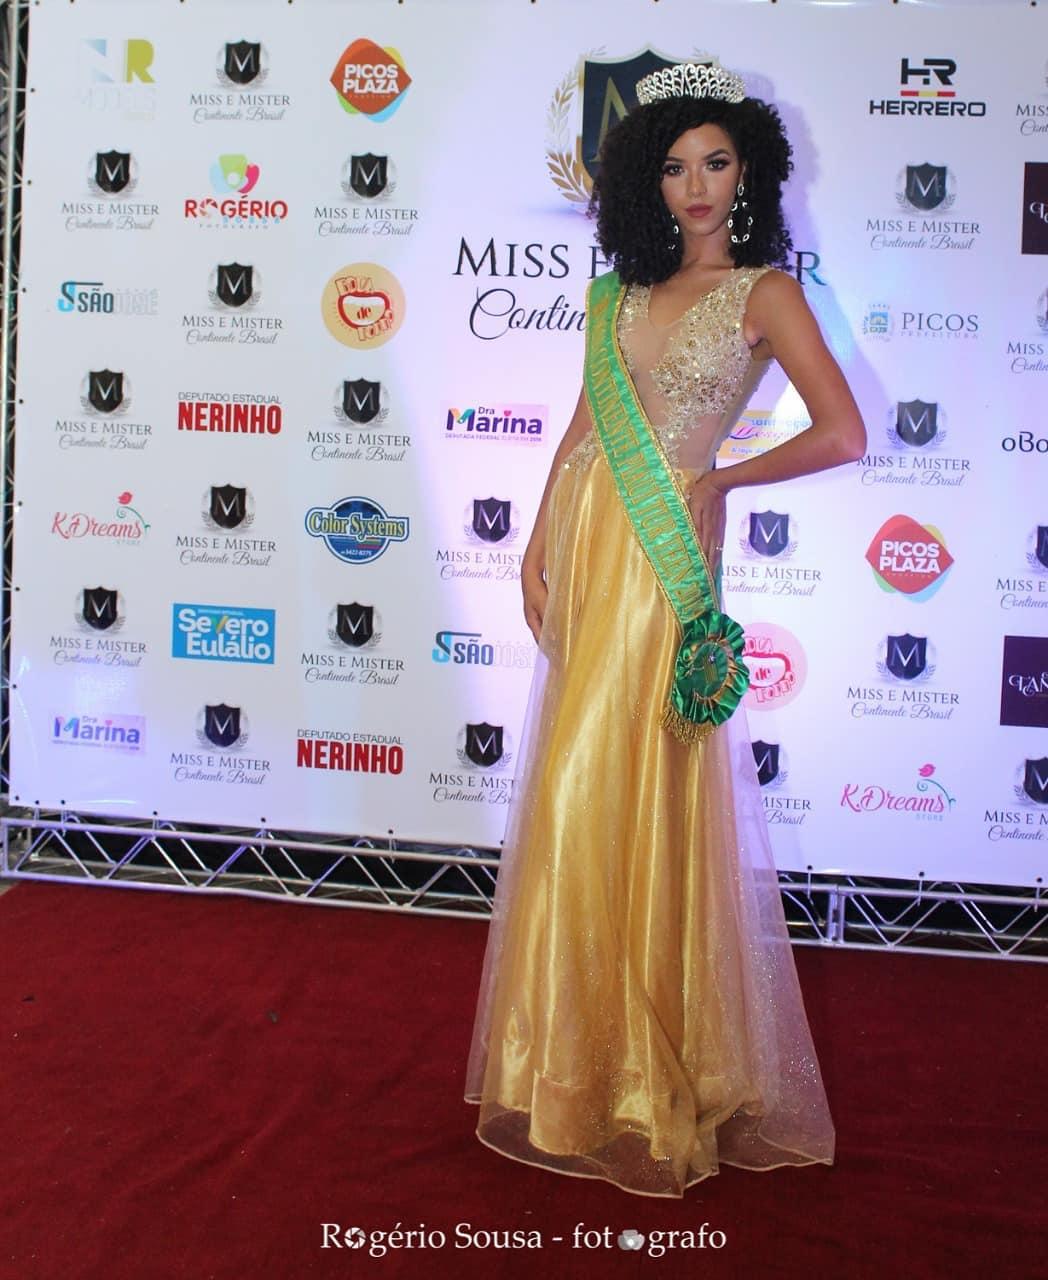 barbara sousa, miss brasil next generation 2019. - Página 3 54511414